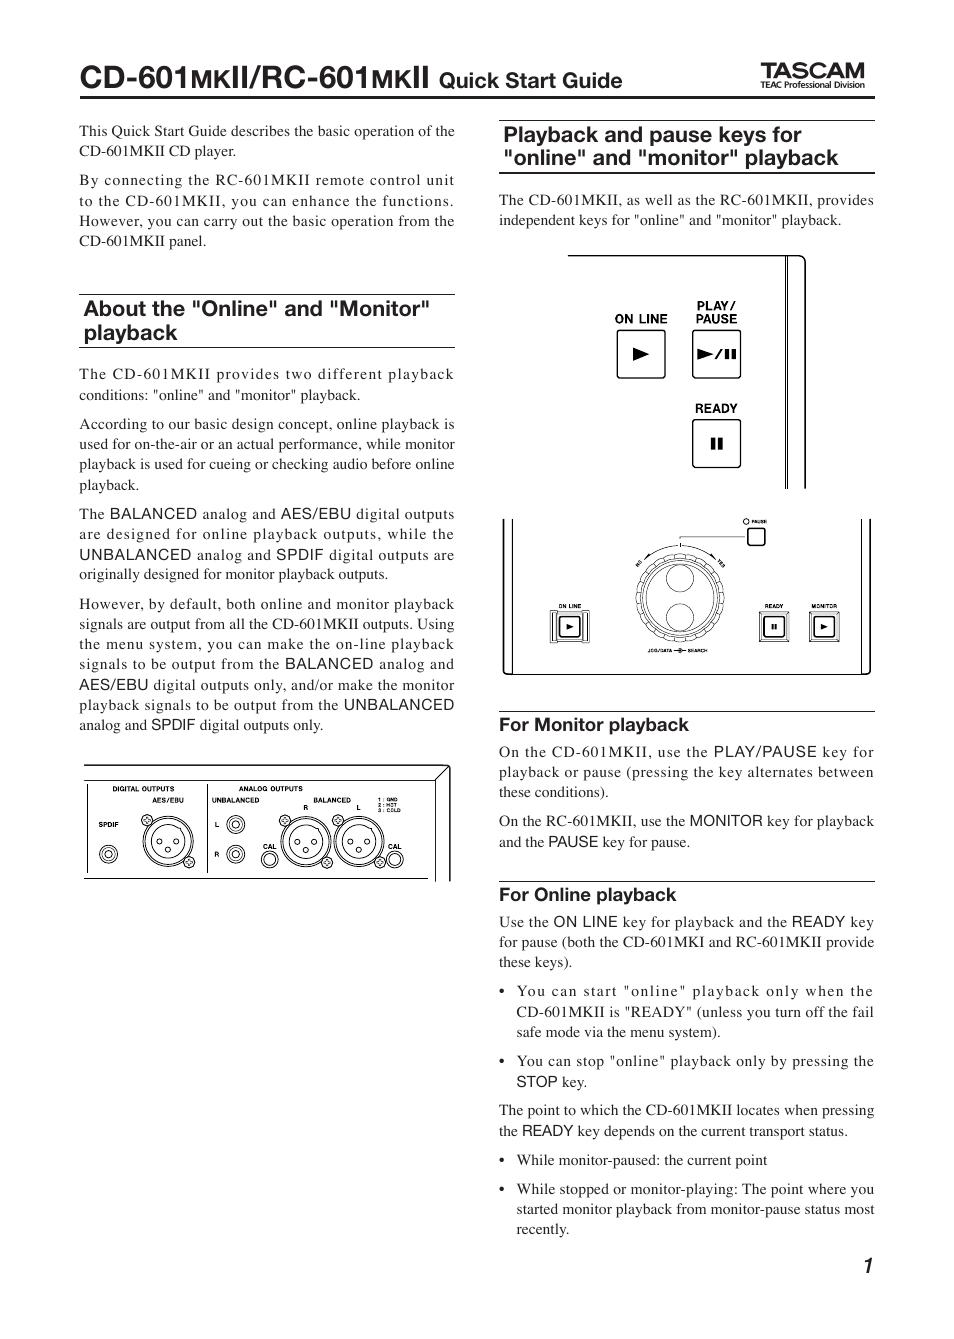 Cd-601, ii/rc-601, quick start guide | tascam cd-601mkii user.